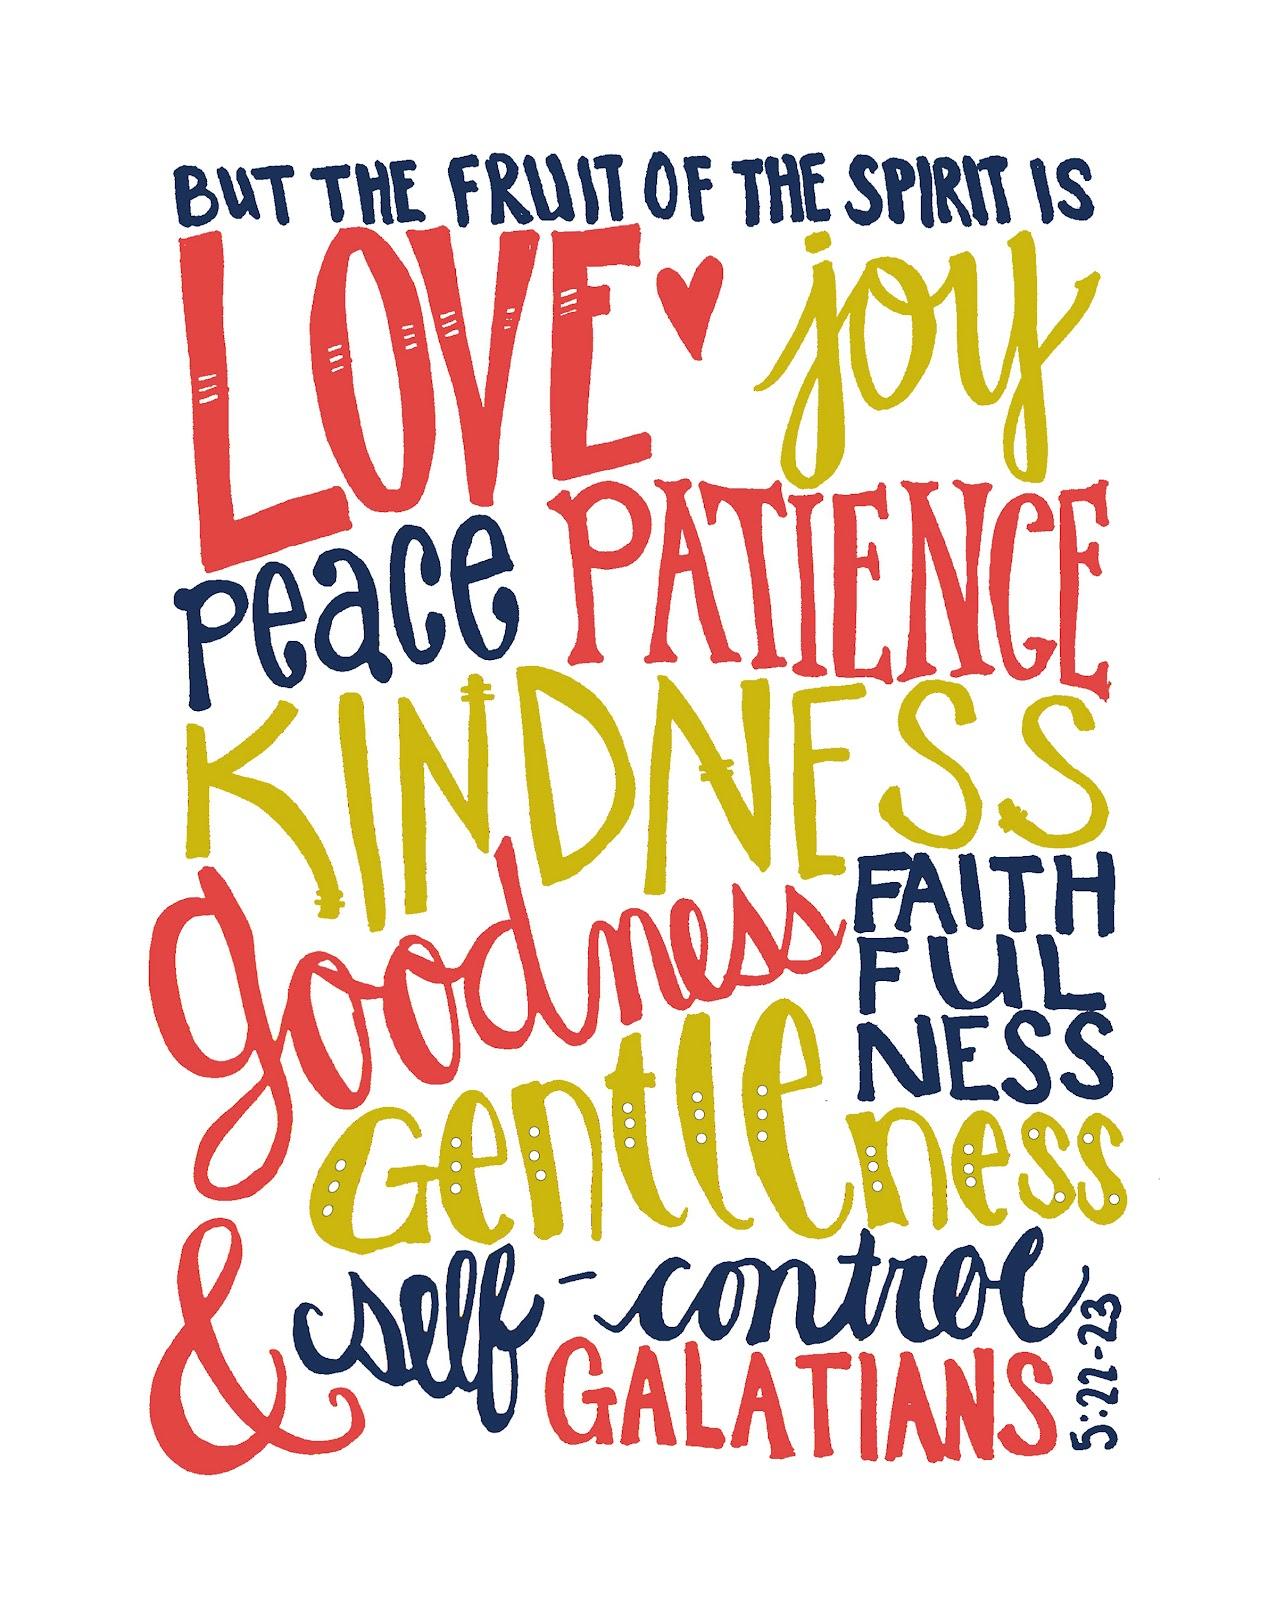 1-31-13-Fruit-of-the-Spirit-